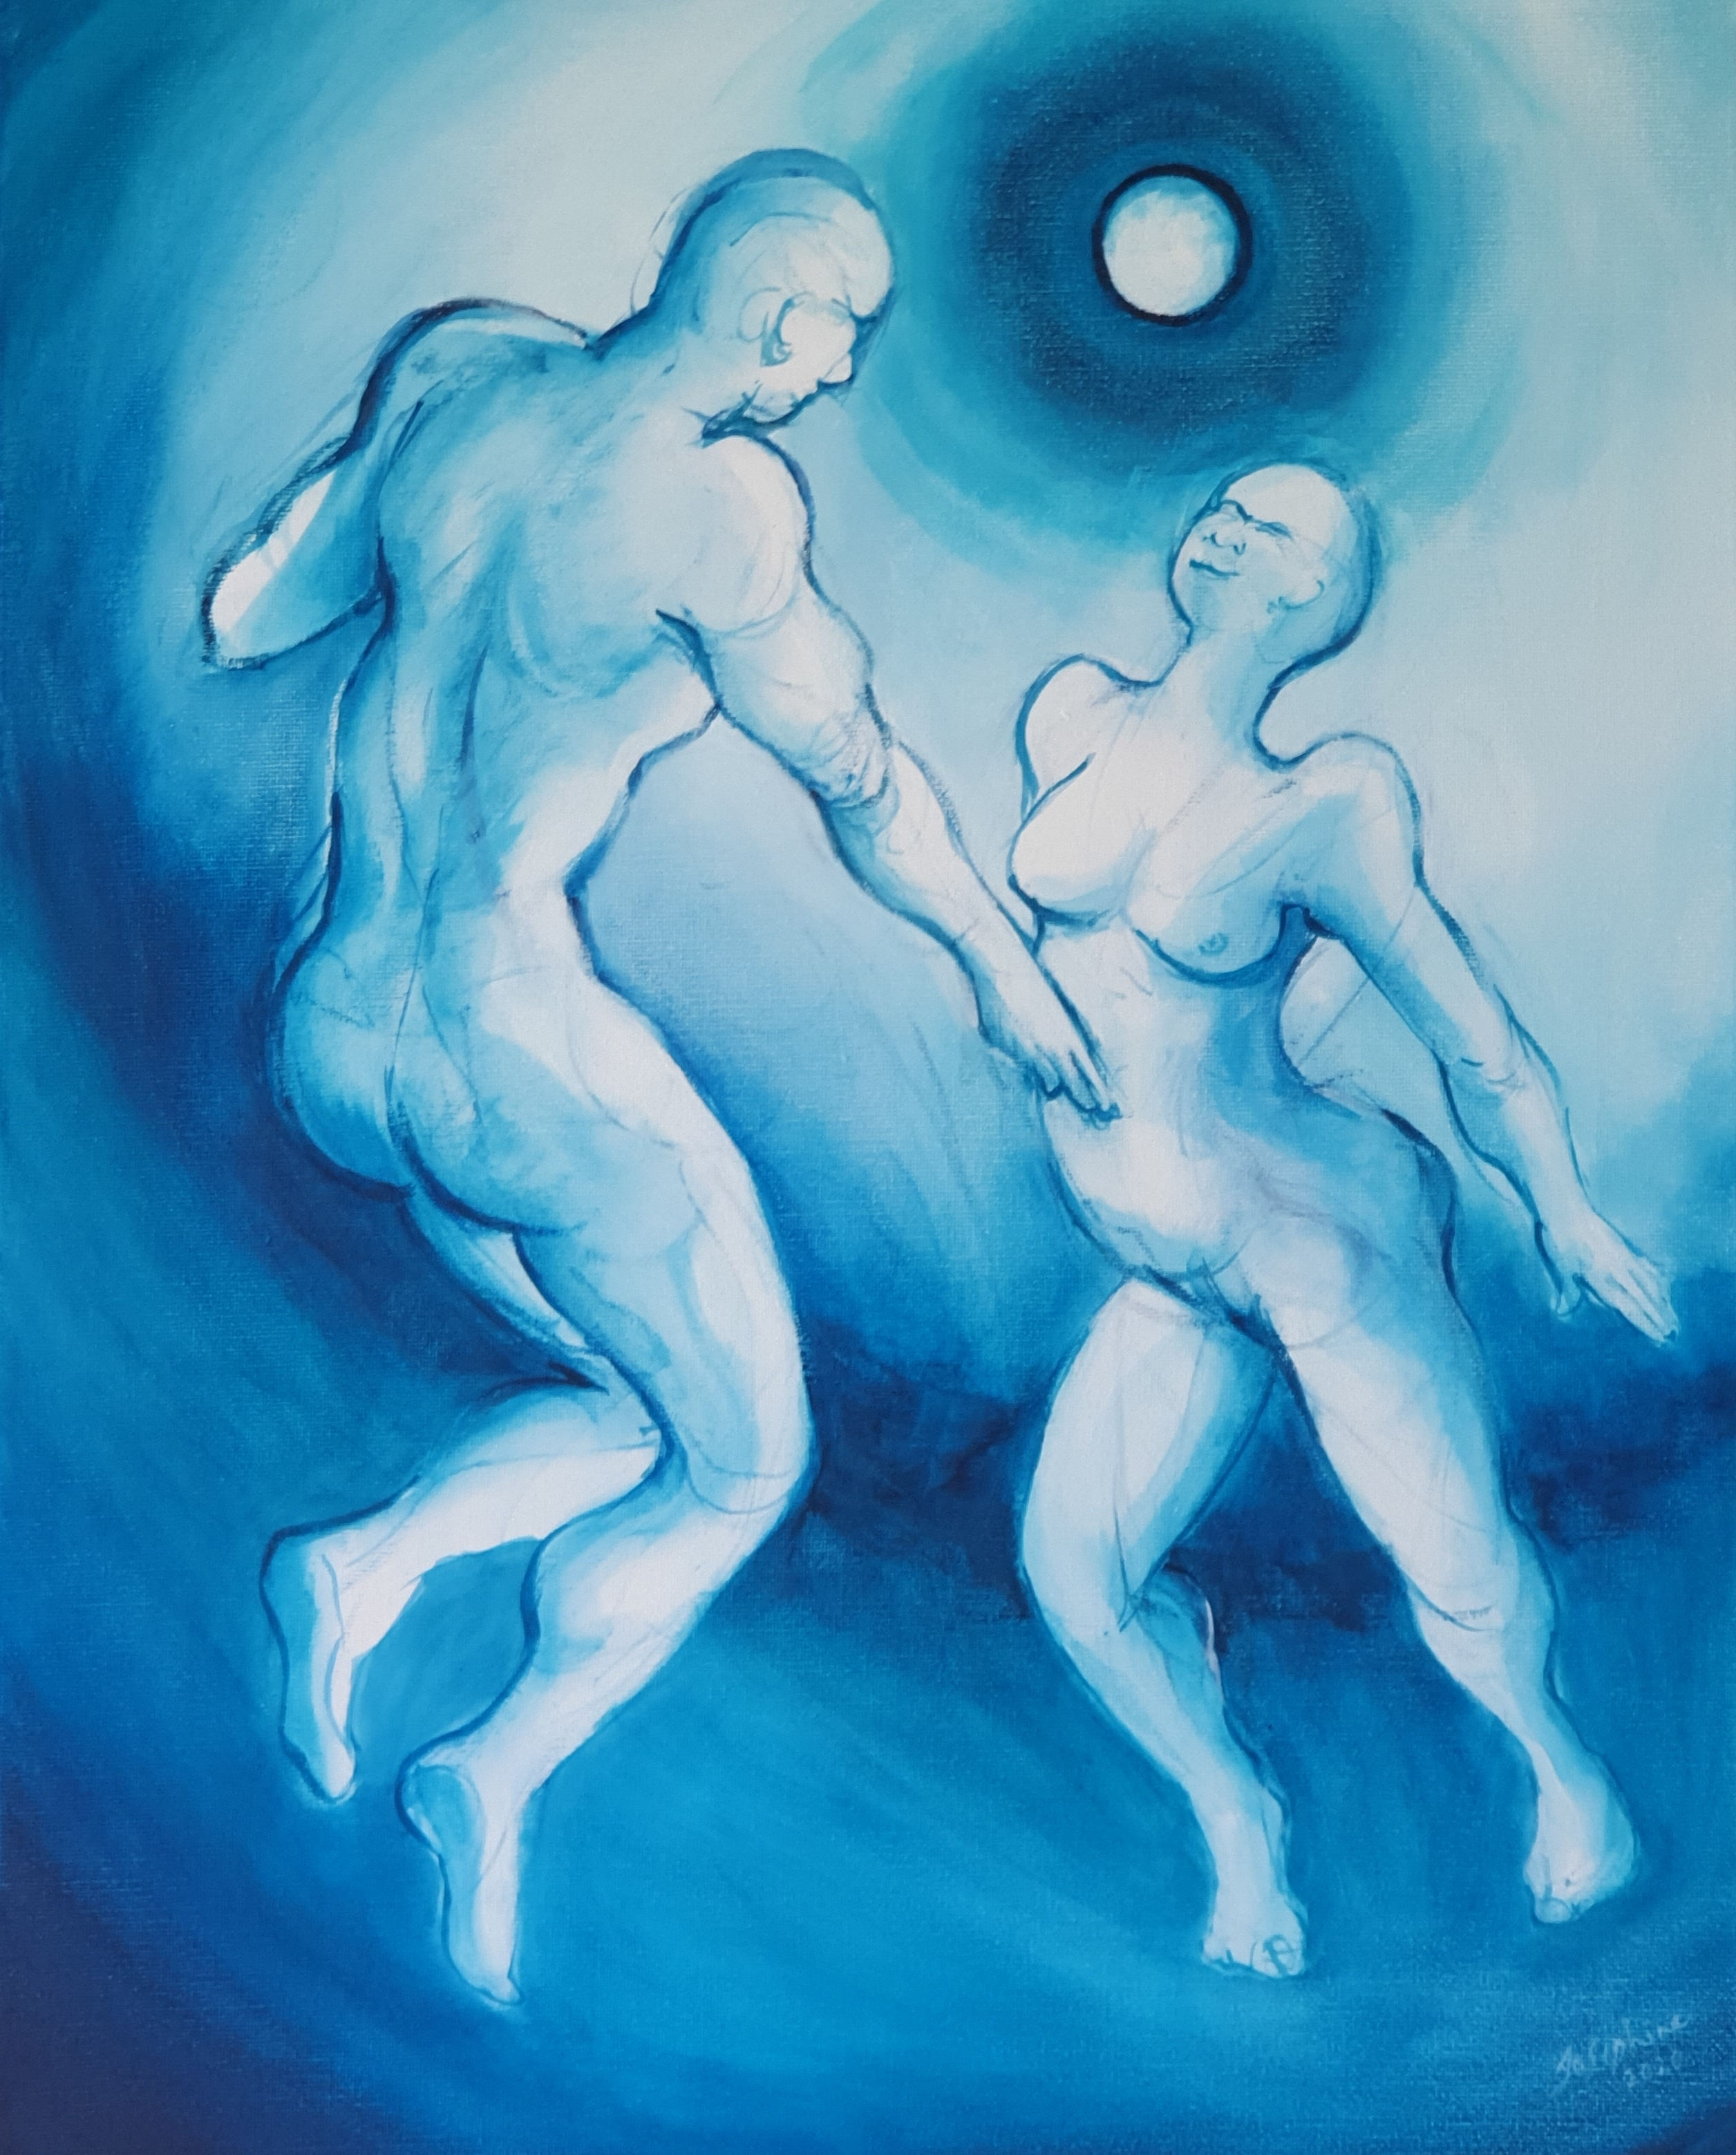 005 Josephine Allen Ascension Moondance